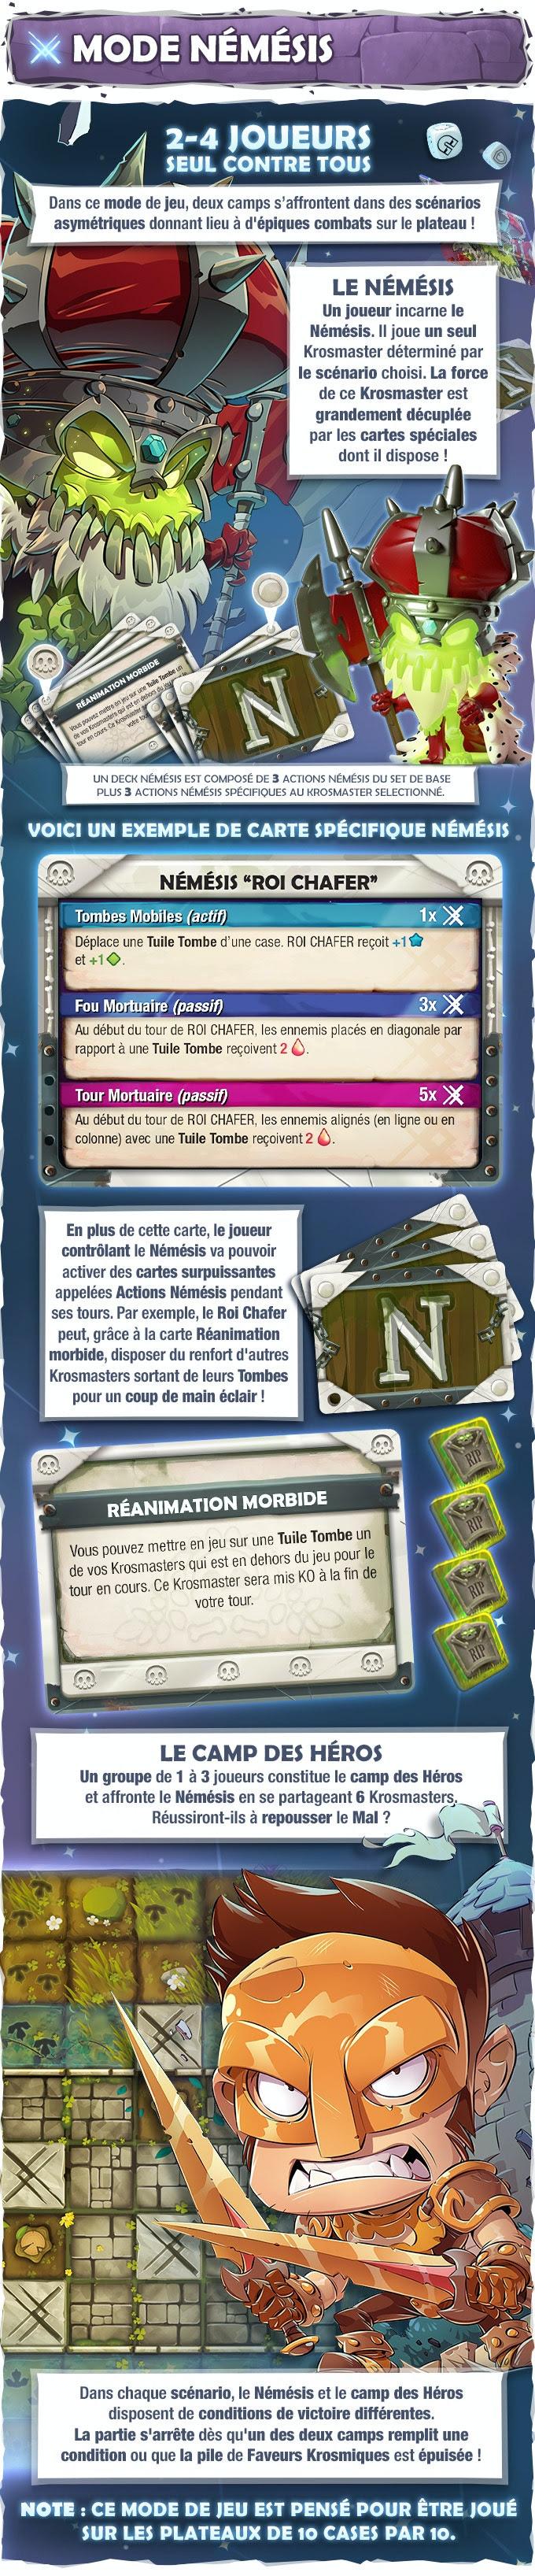 Krosmaster blast, la campagne - Page 4 89340f302b990a9e8ad8134fd12ce479_original.jpg?ixlib=rb-1.1